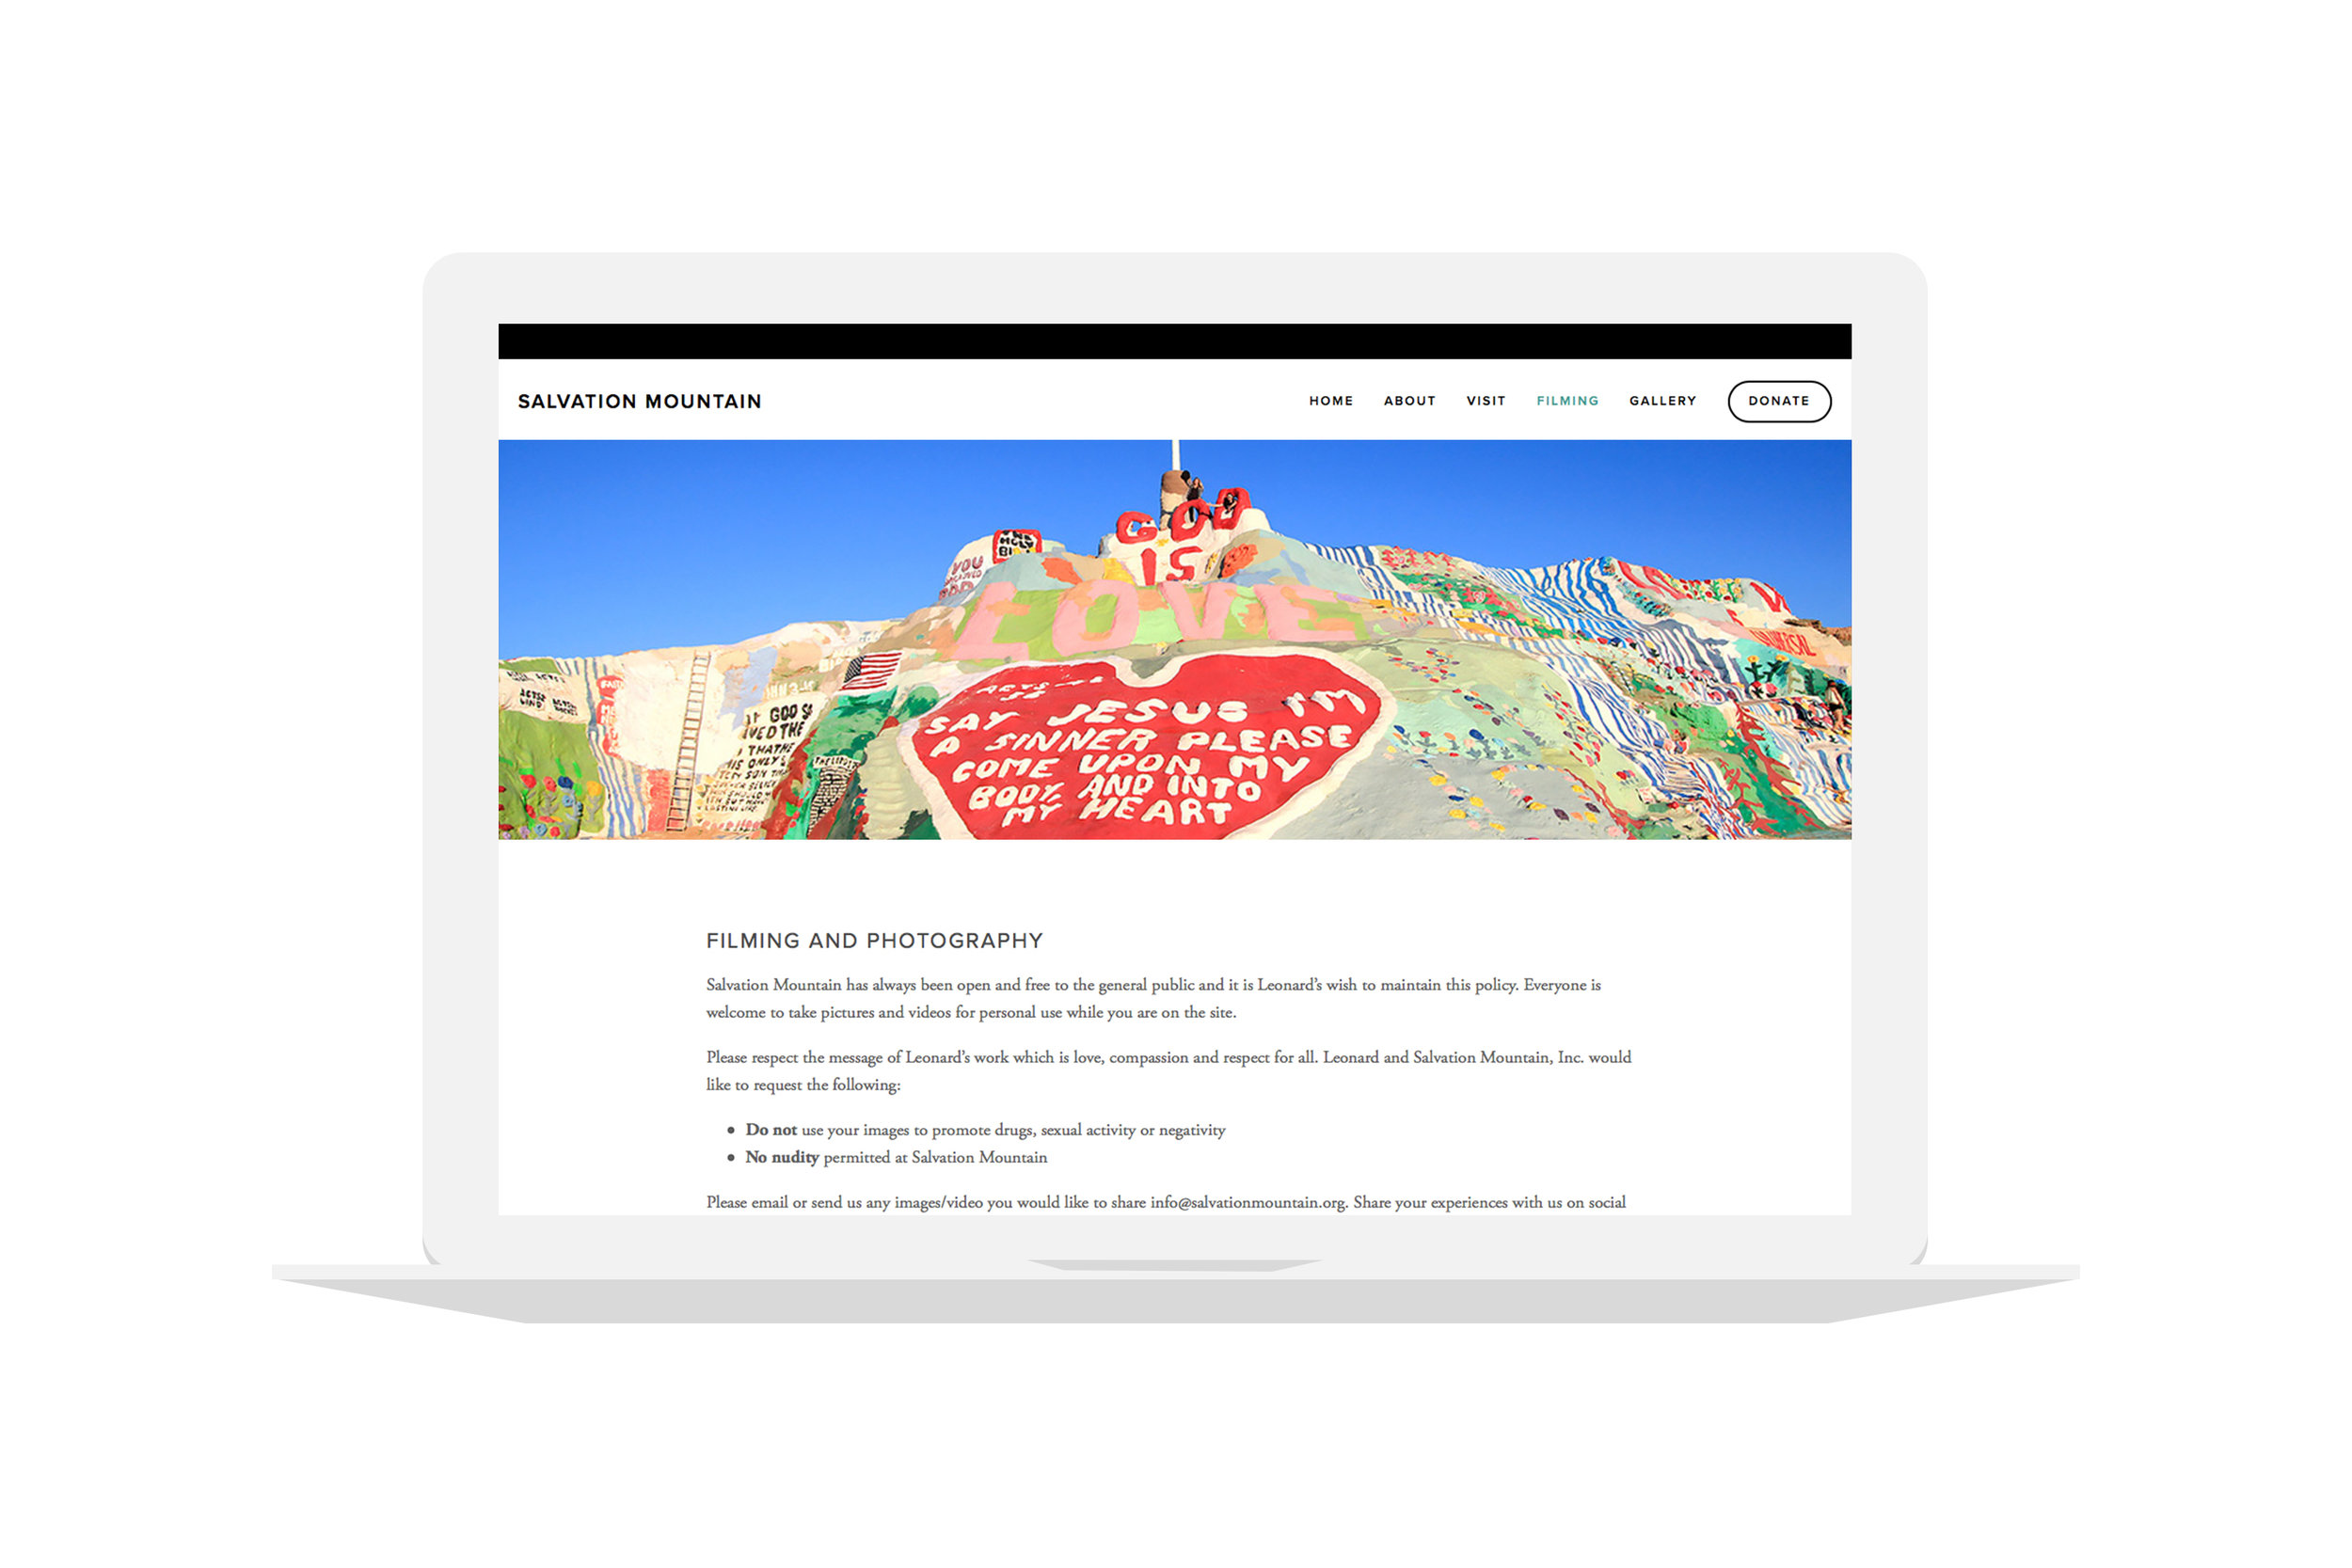 chrissihernandez-salvationMountain-website-home.jpg